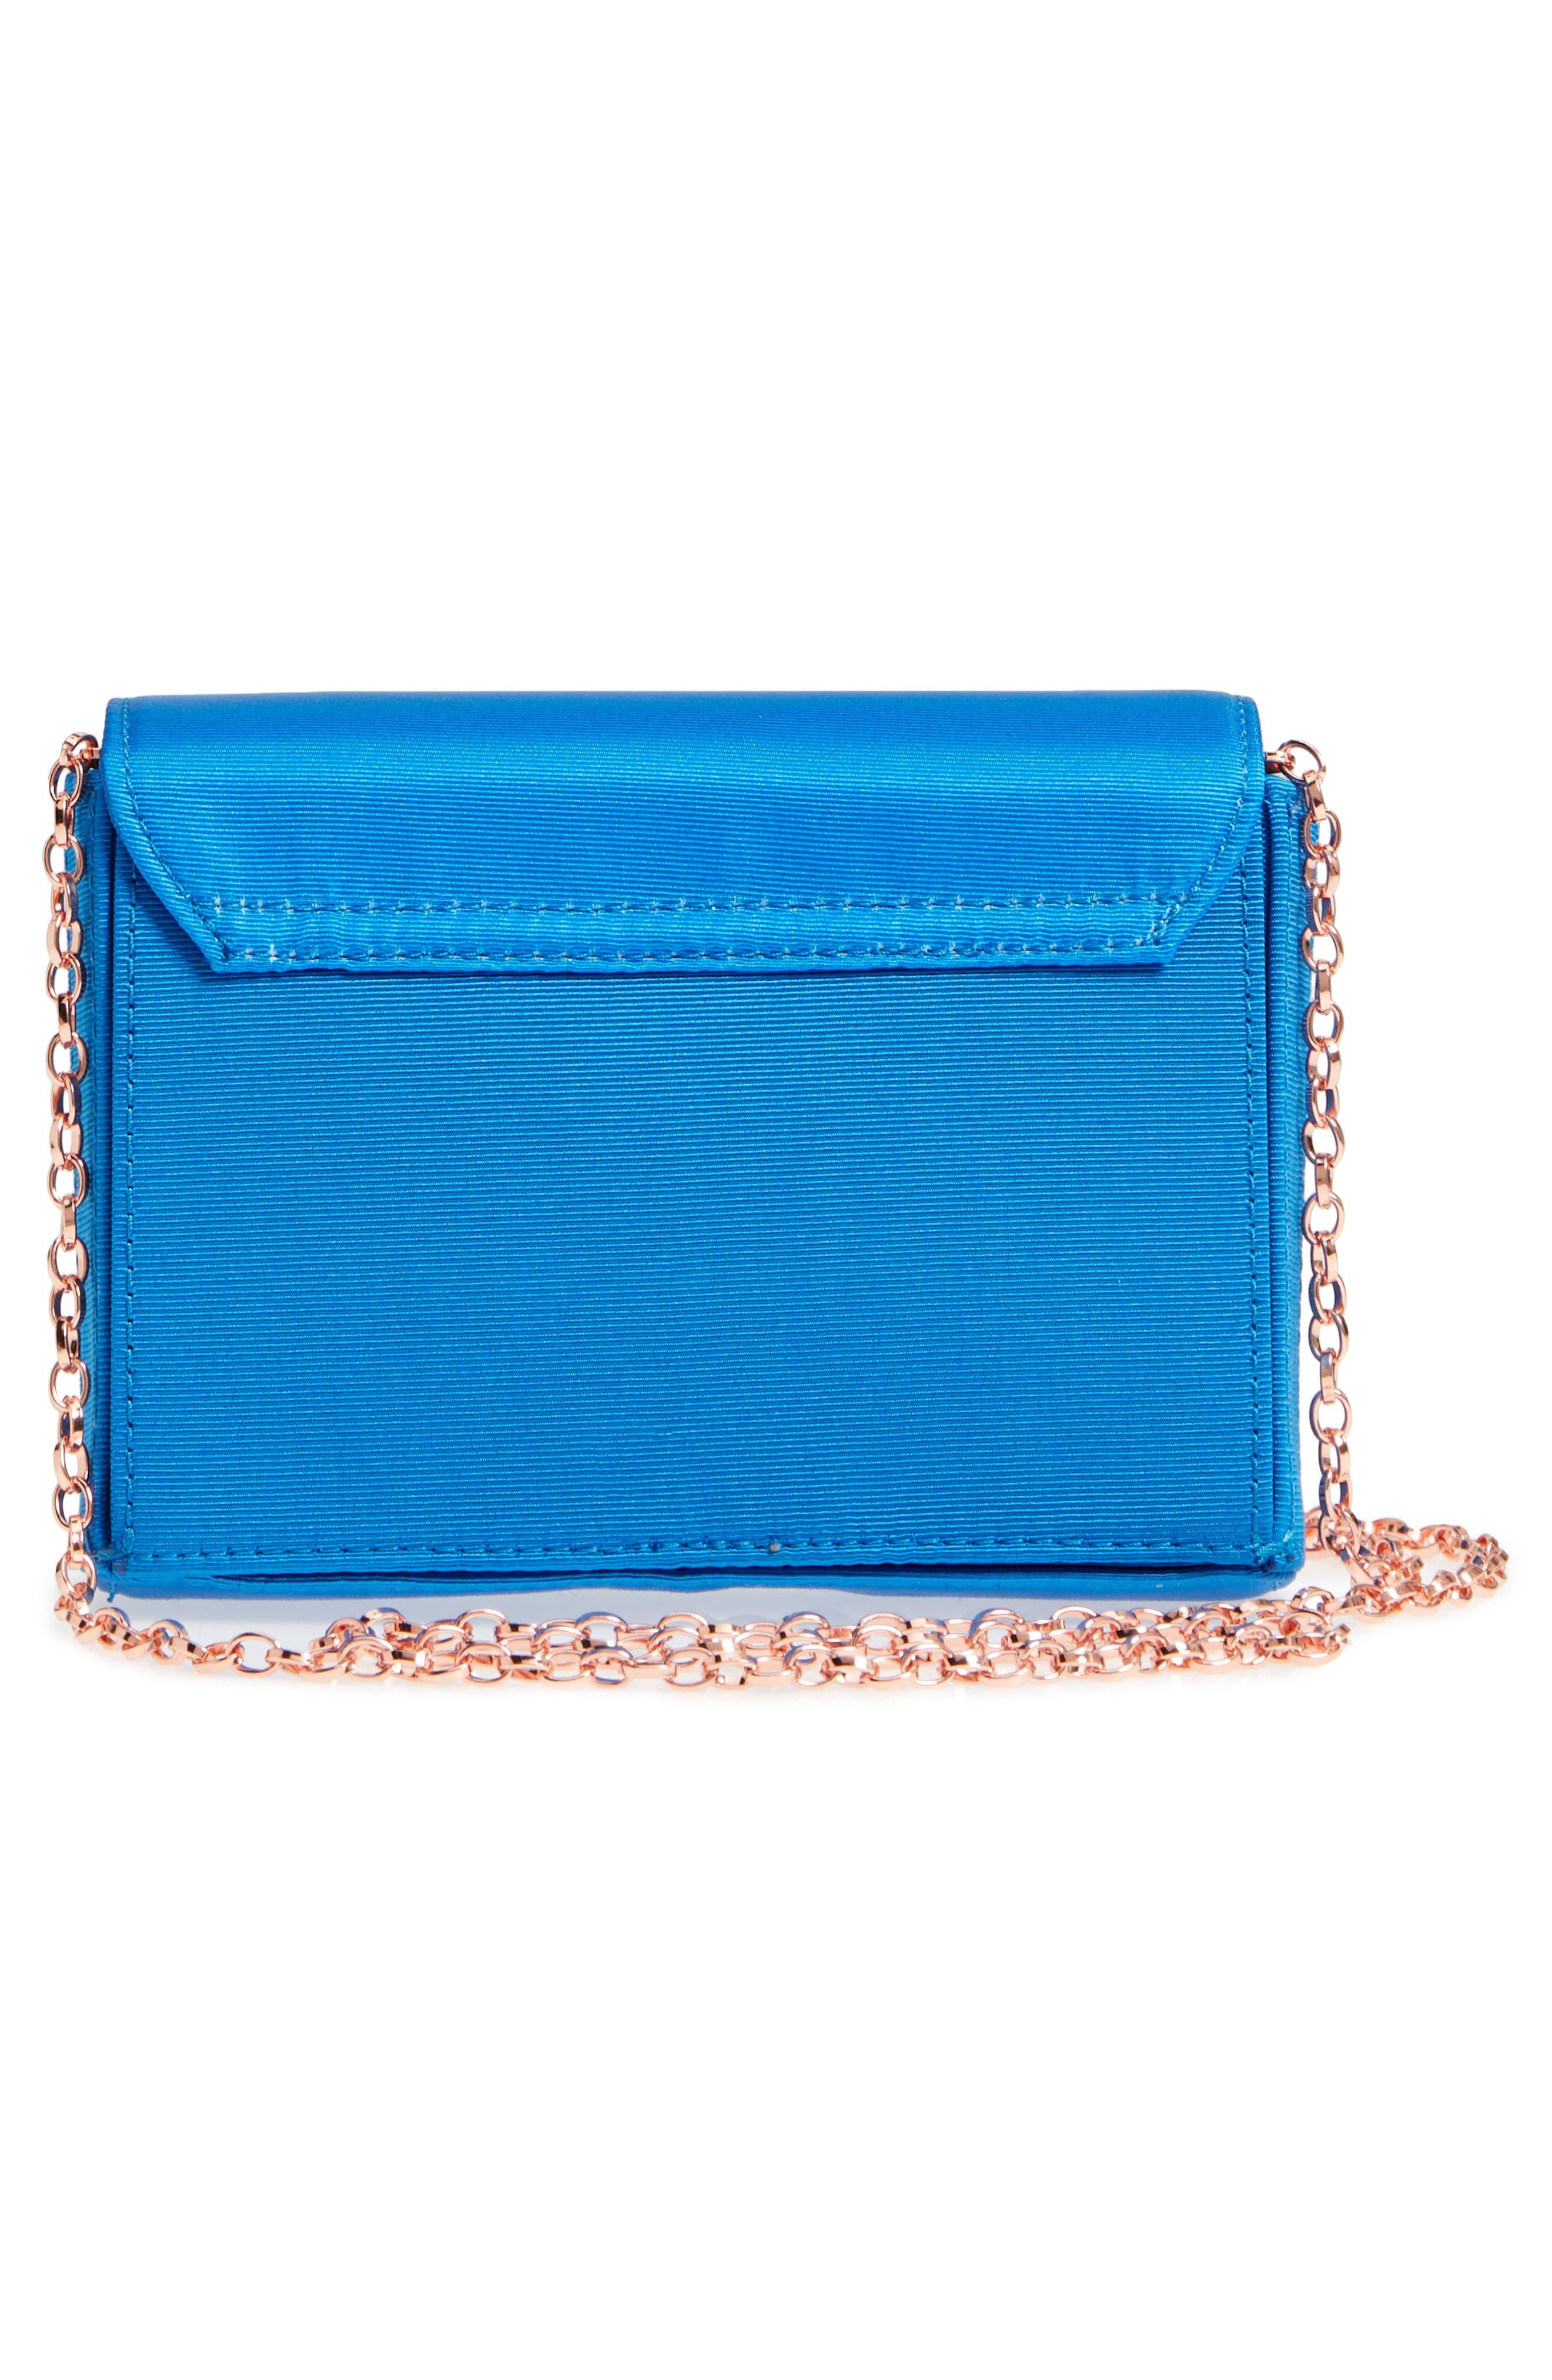 Harmony Print Evening Bag,                             Alternate thumbnail 3, color,                             Bright Blue